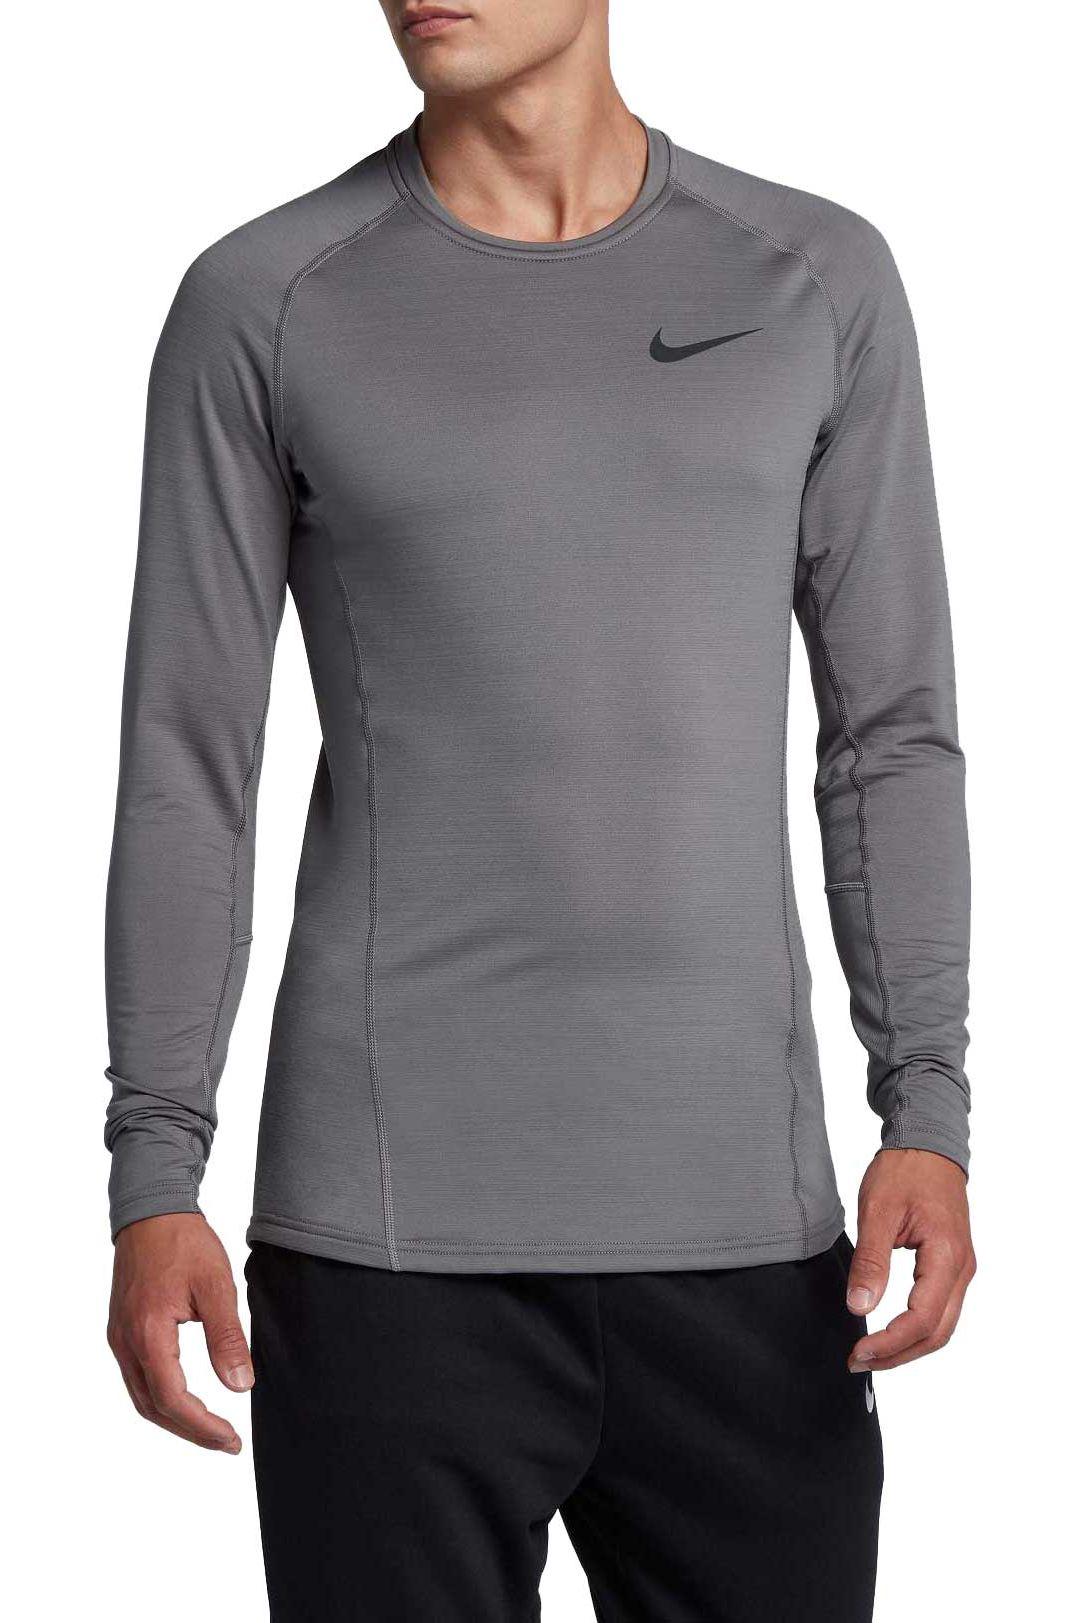 b453043647c8 Nike Men's Pro Therma Dri-FIT Long Sleeve Shirt | DICK'S Sporting Goods